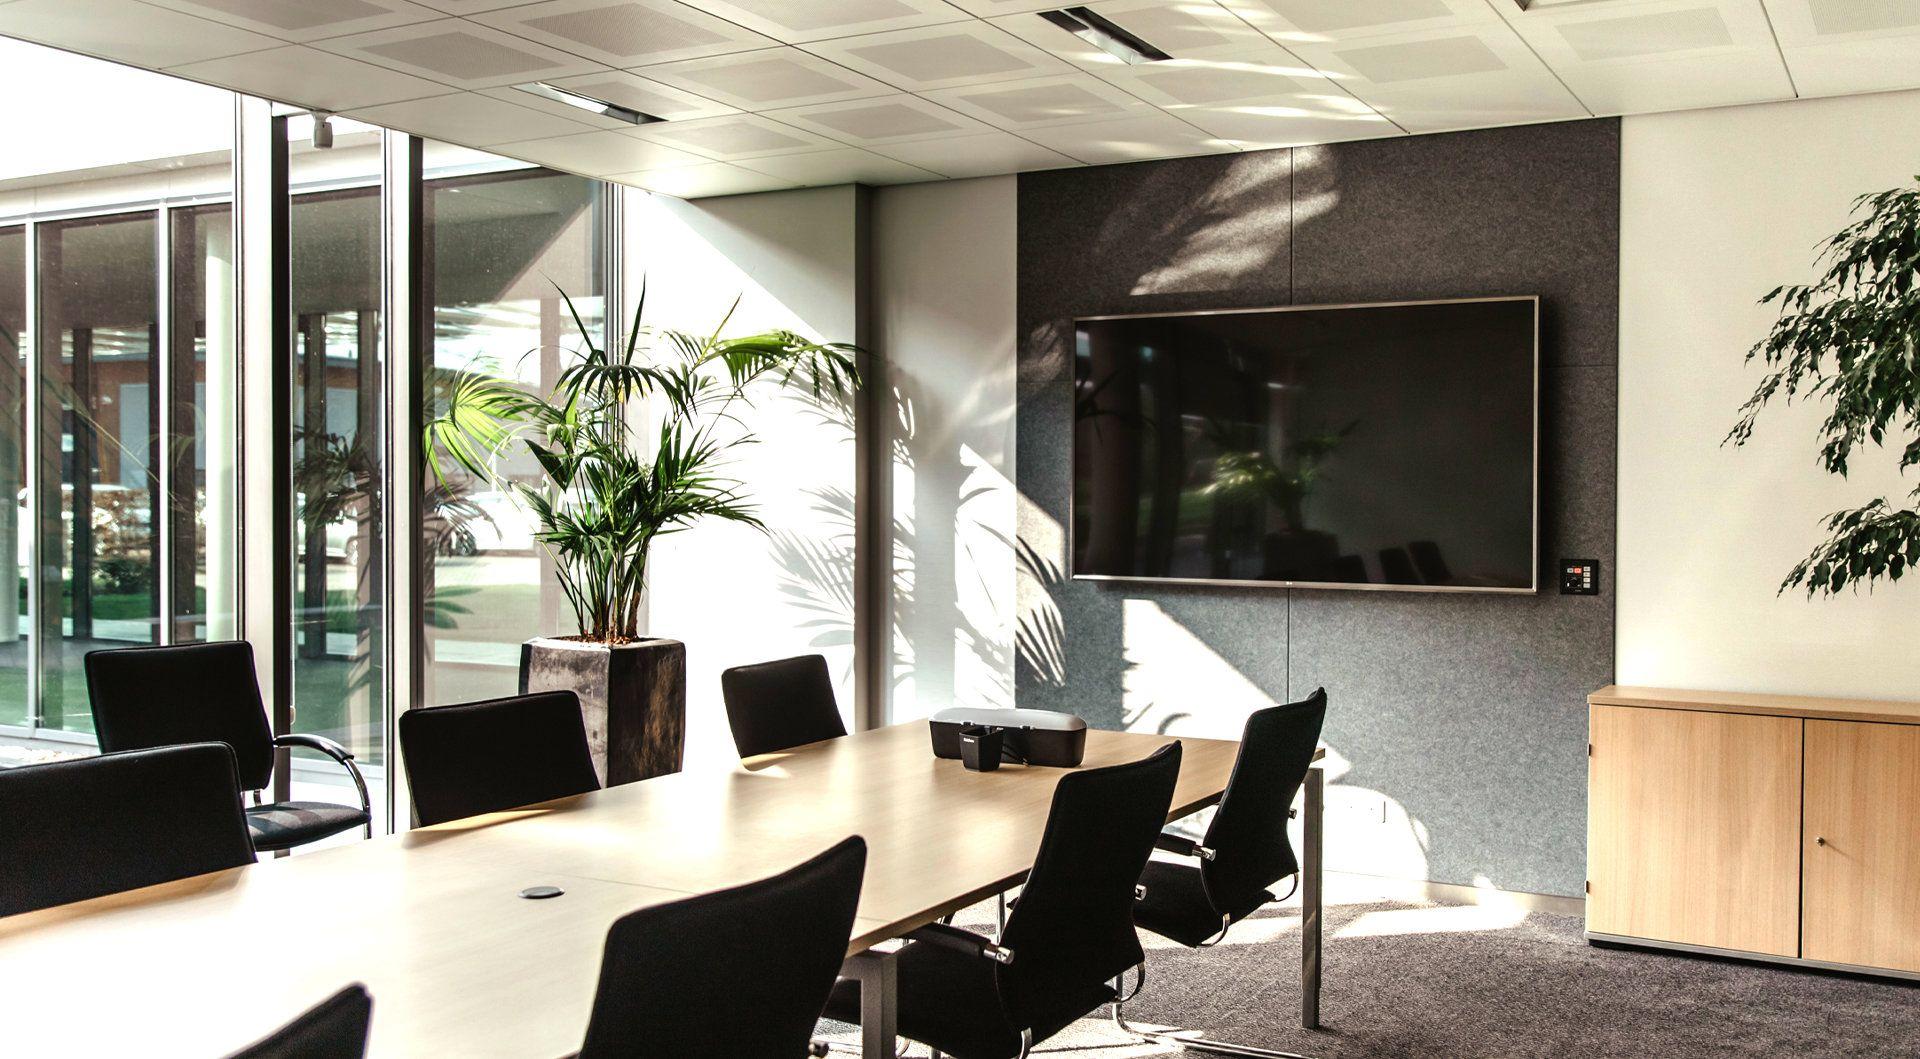 "Chief MFCUB flat panel vloer standaard 165,1 cm (65"") Draagbare flatscreen vloerstandaard Zwart - Case studie de vries"